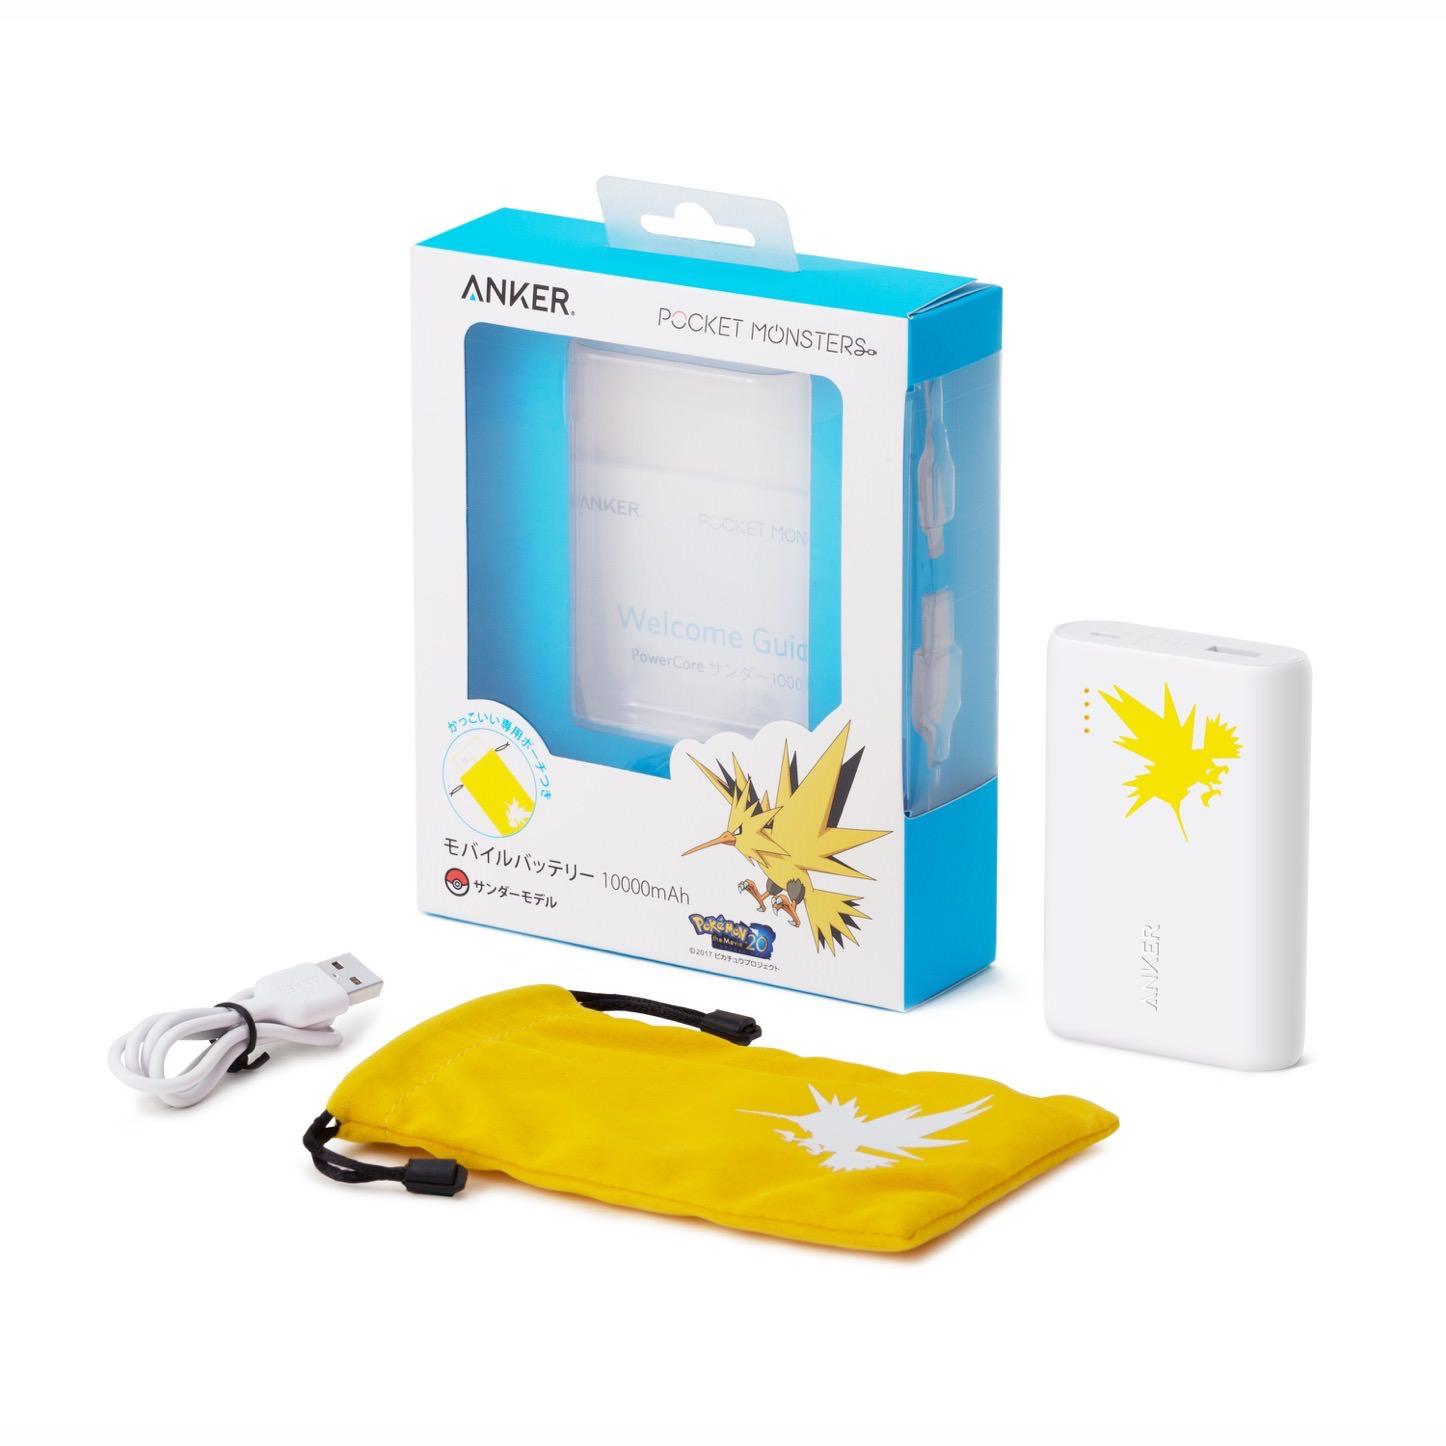 Anker-Pokemon-Mobile-Accessories-06.jpg